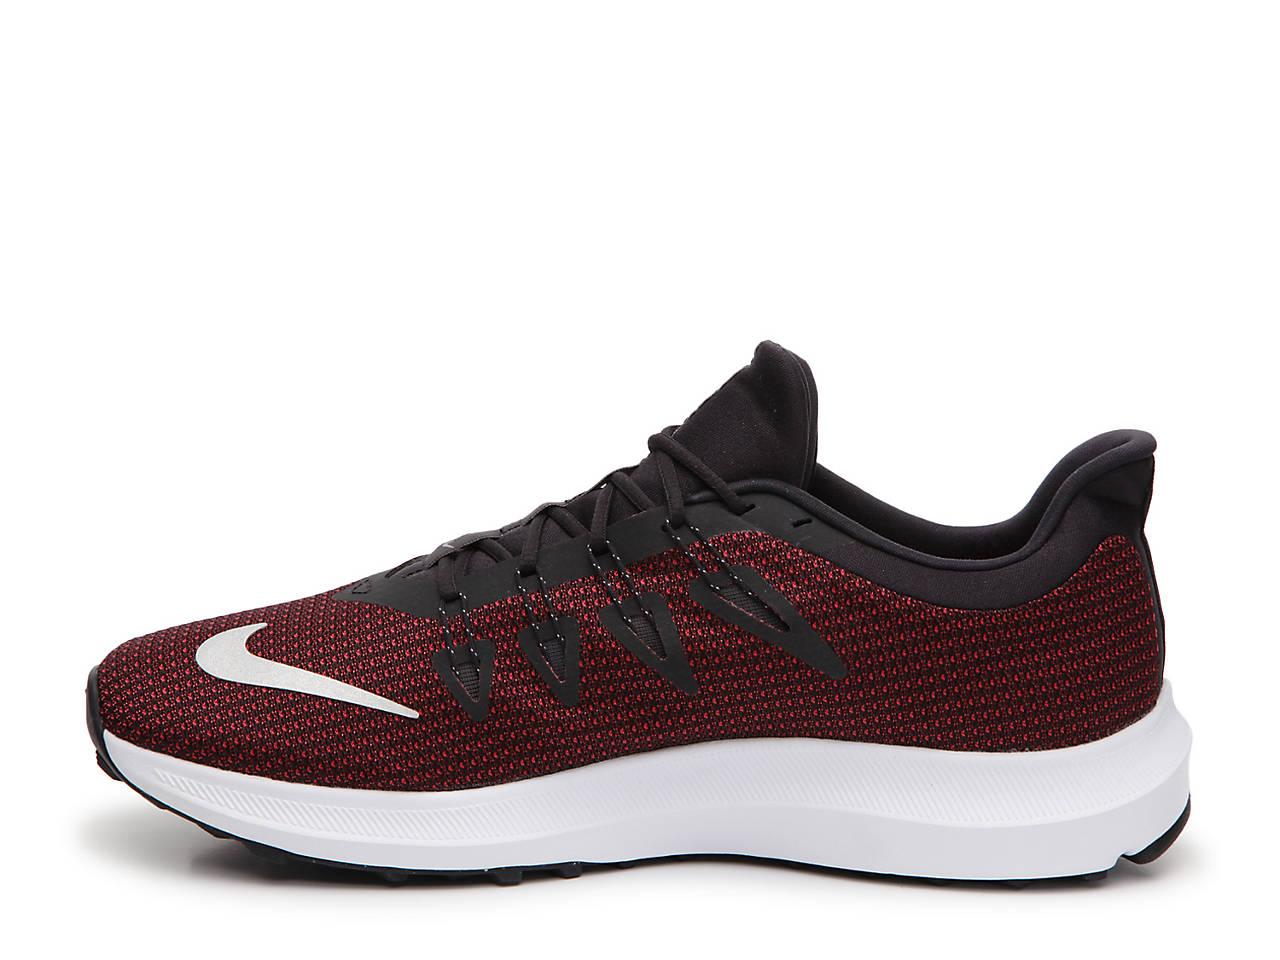 bde14593e47 Nike Quest Lightweight Running Shoe - Men s Men s Shoes